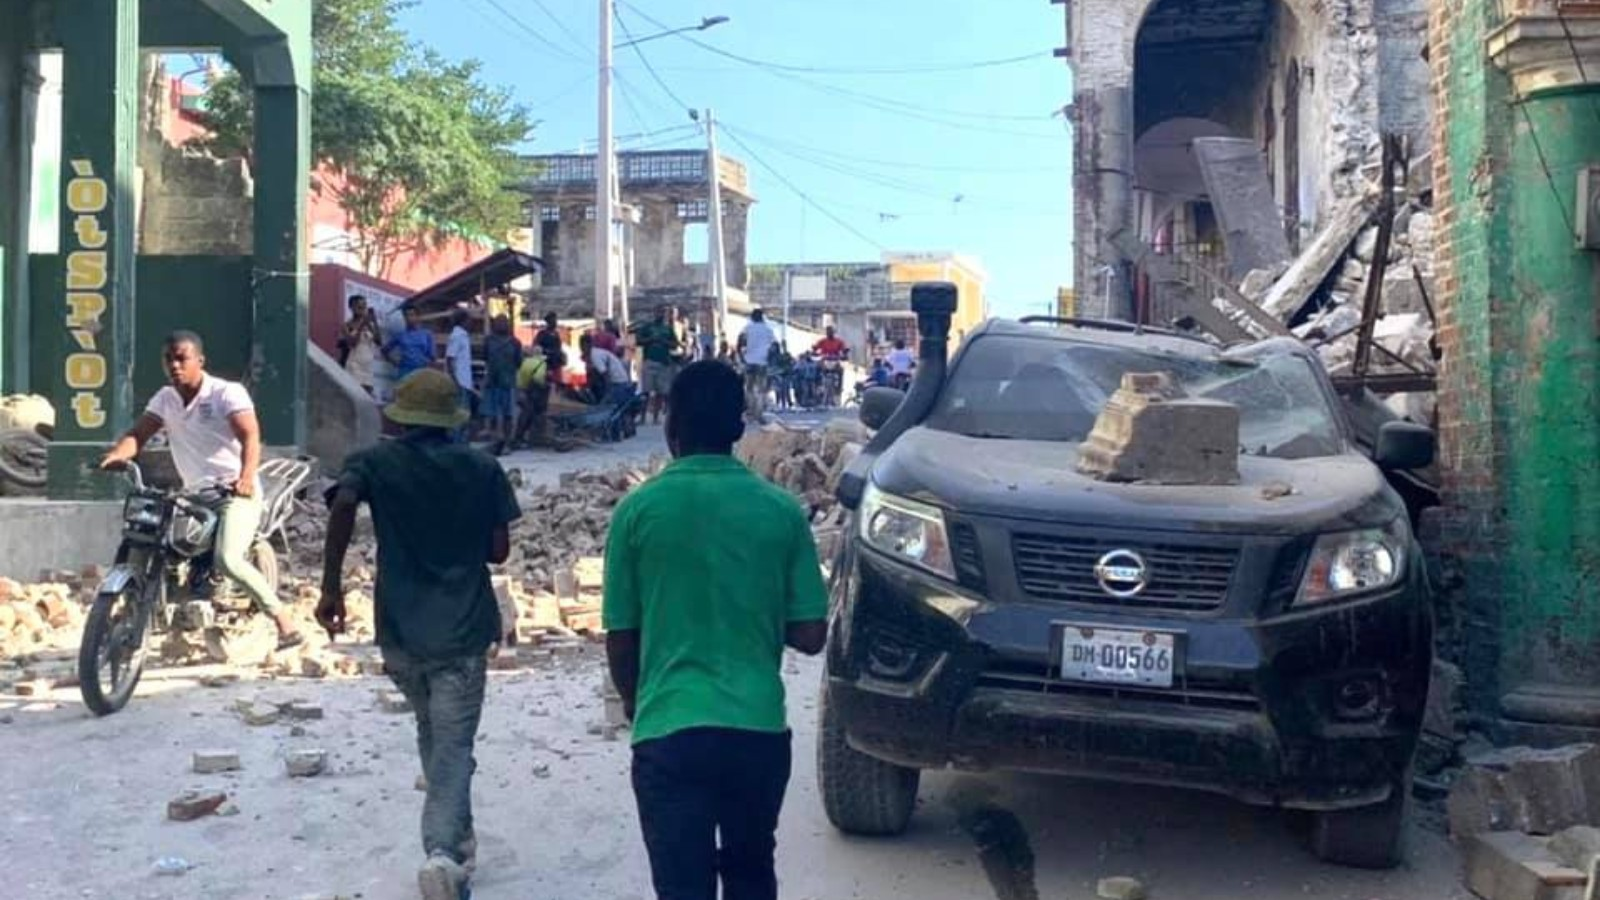 Israeli Aid Groups Respond To Haiti Quake